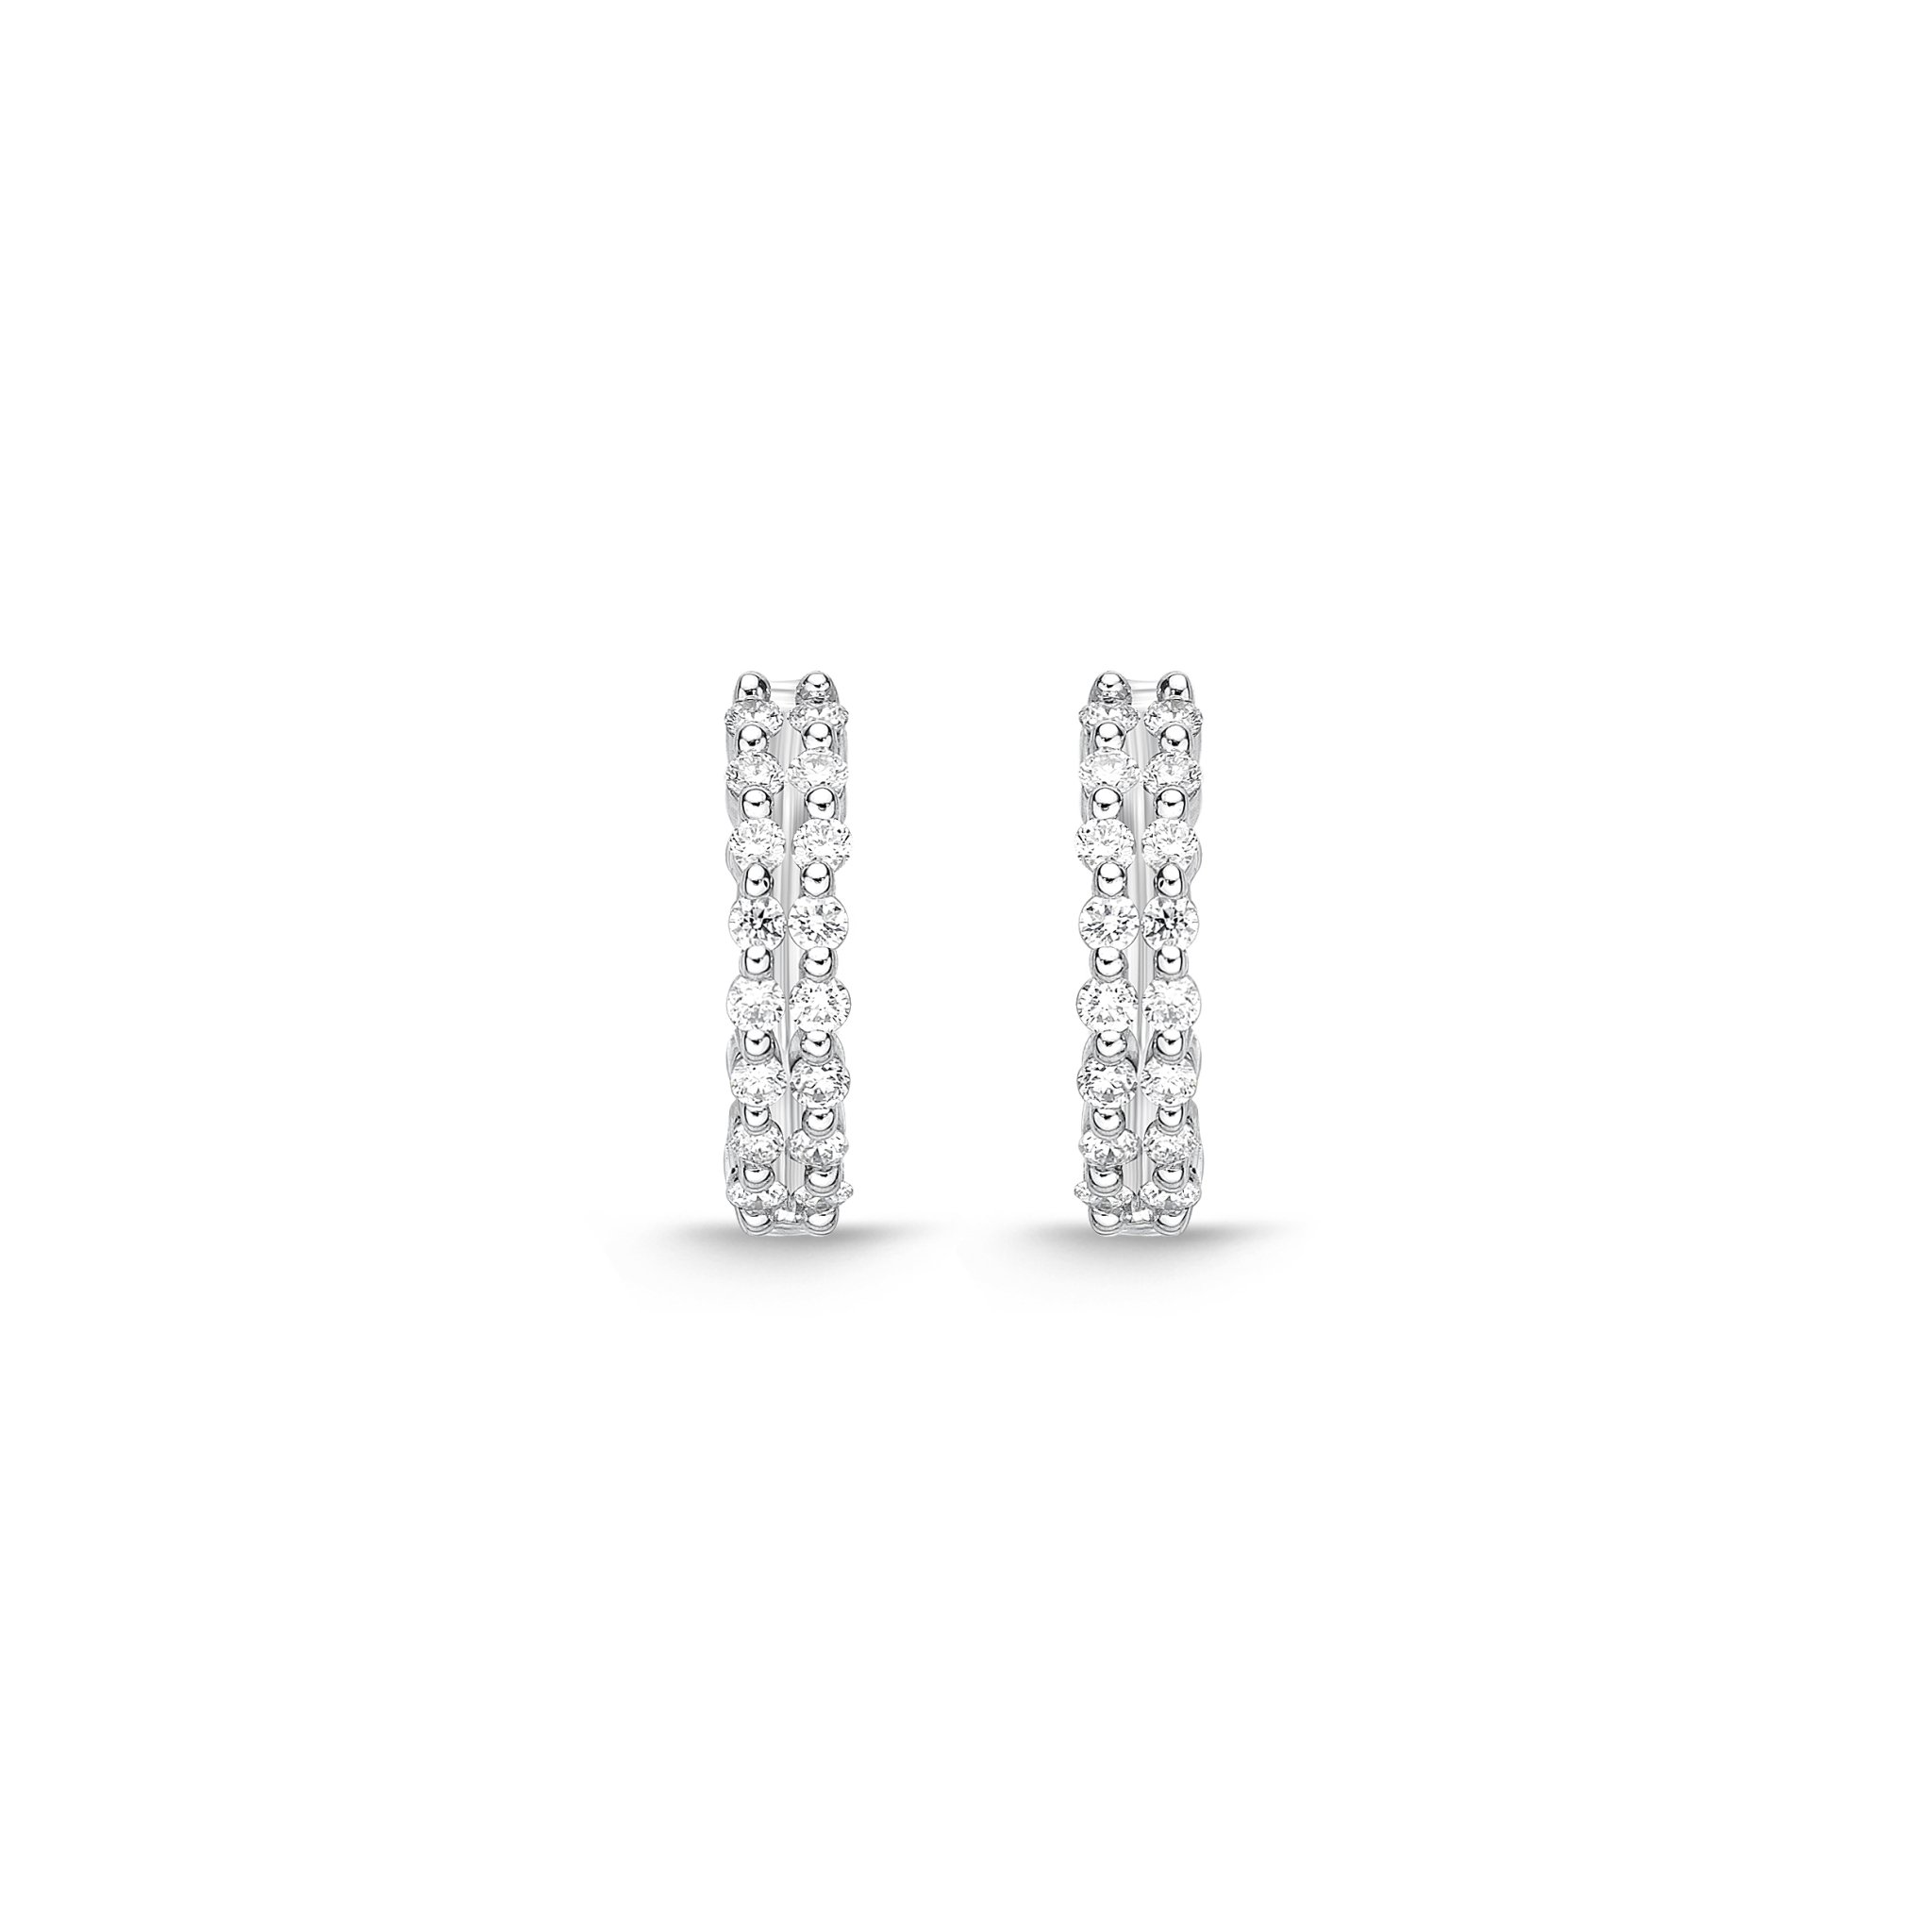 Memoire 18ct White Gold 1/5 Carat Diamond Hoop Earrings 12x12mm